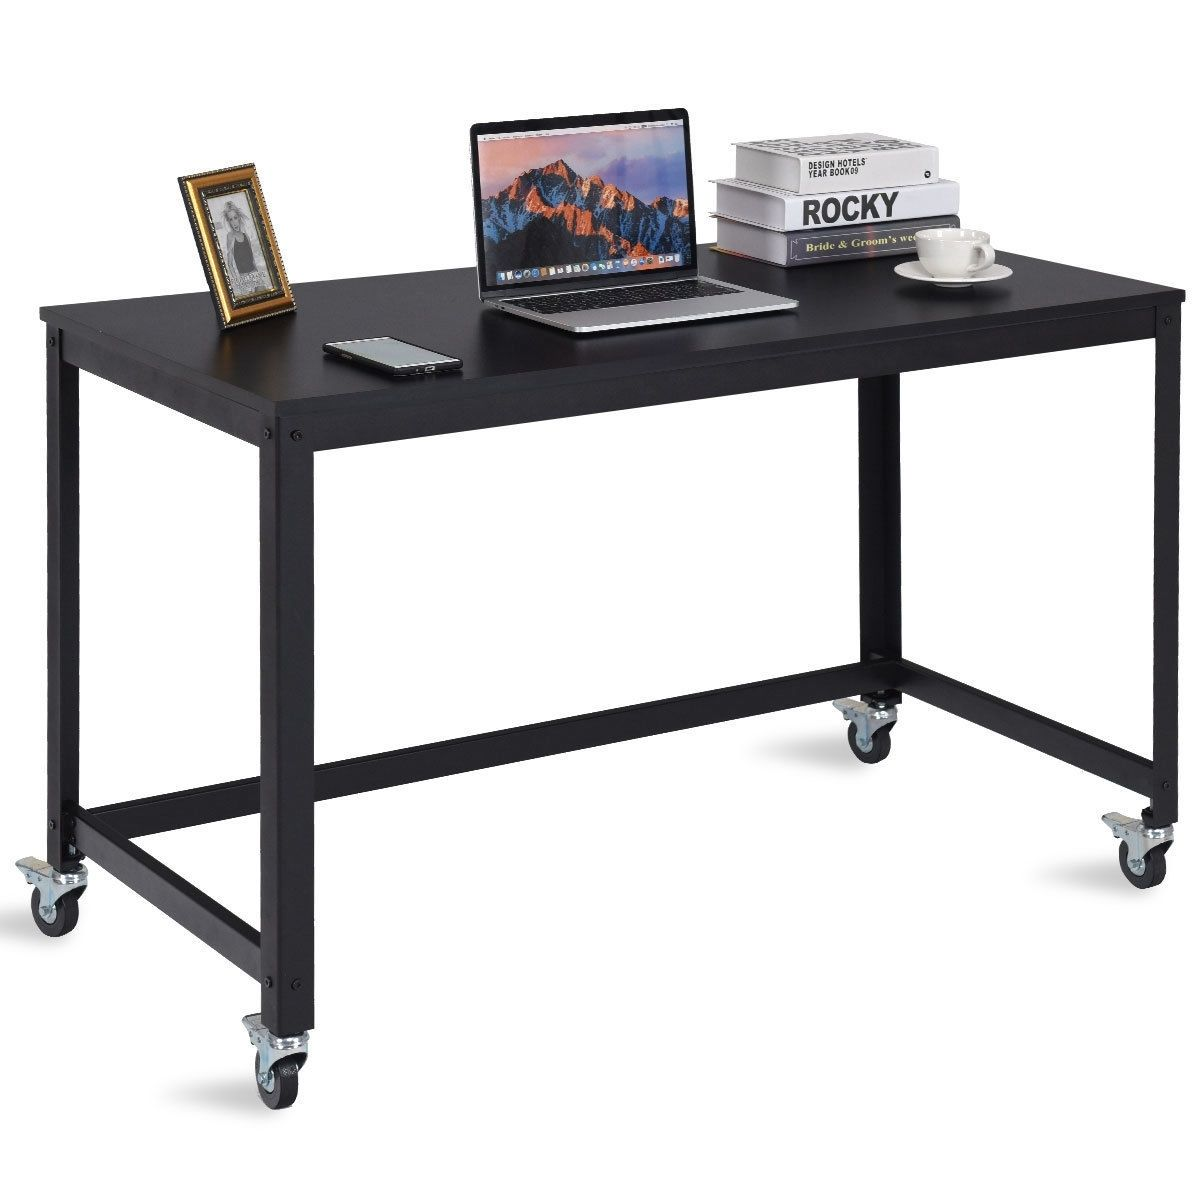 Wood Top Metal Frame Rolling Computer Desk Laptop Table Black In 2020 Wood Office Desk Home Office Furniture Desk Home Office Desks